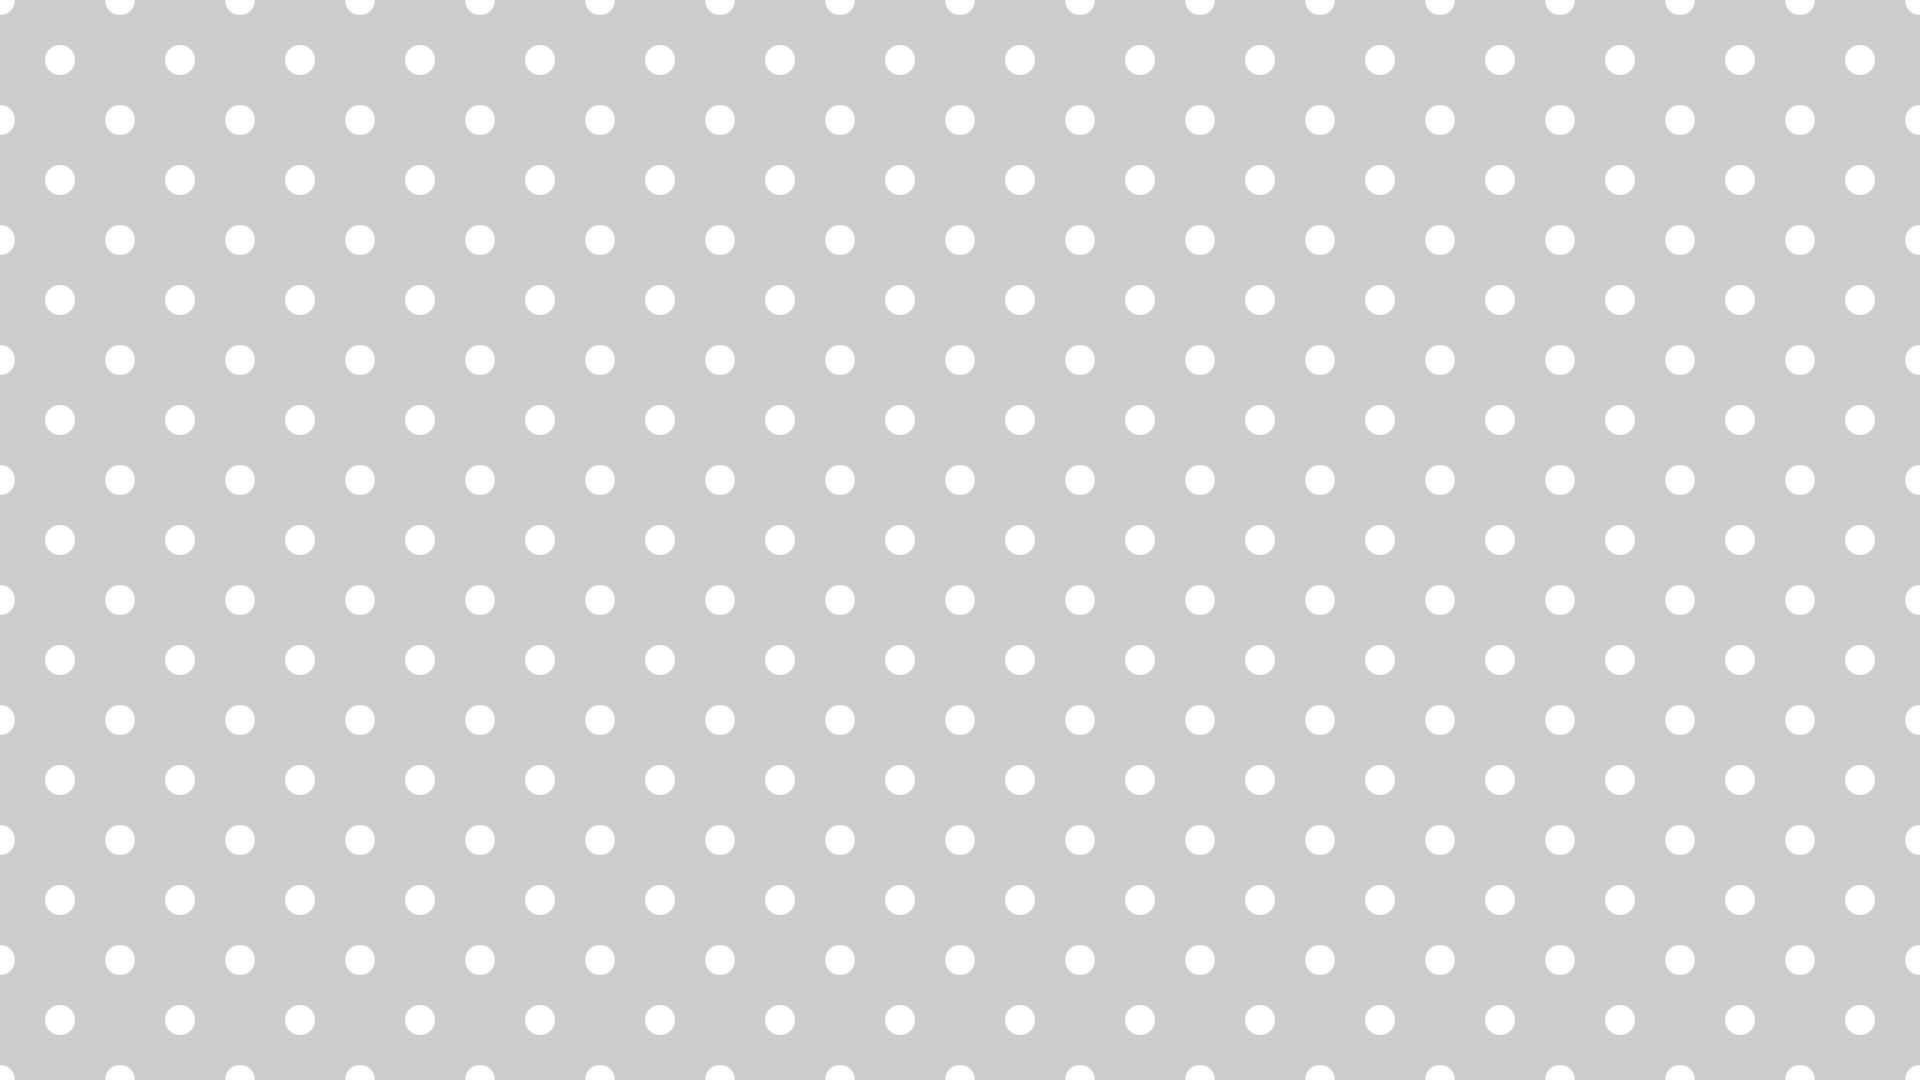 hd pics photos stunning attractive polka dots 25 hd desktop background  wallpaper